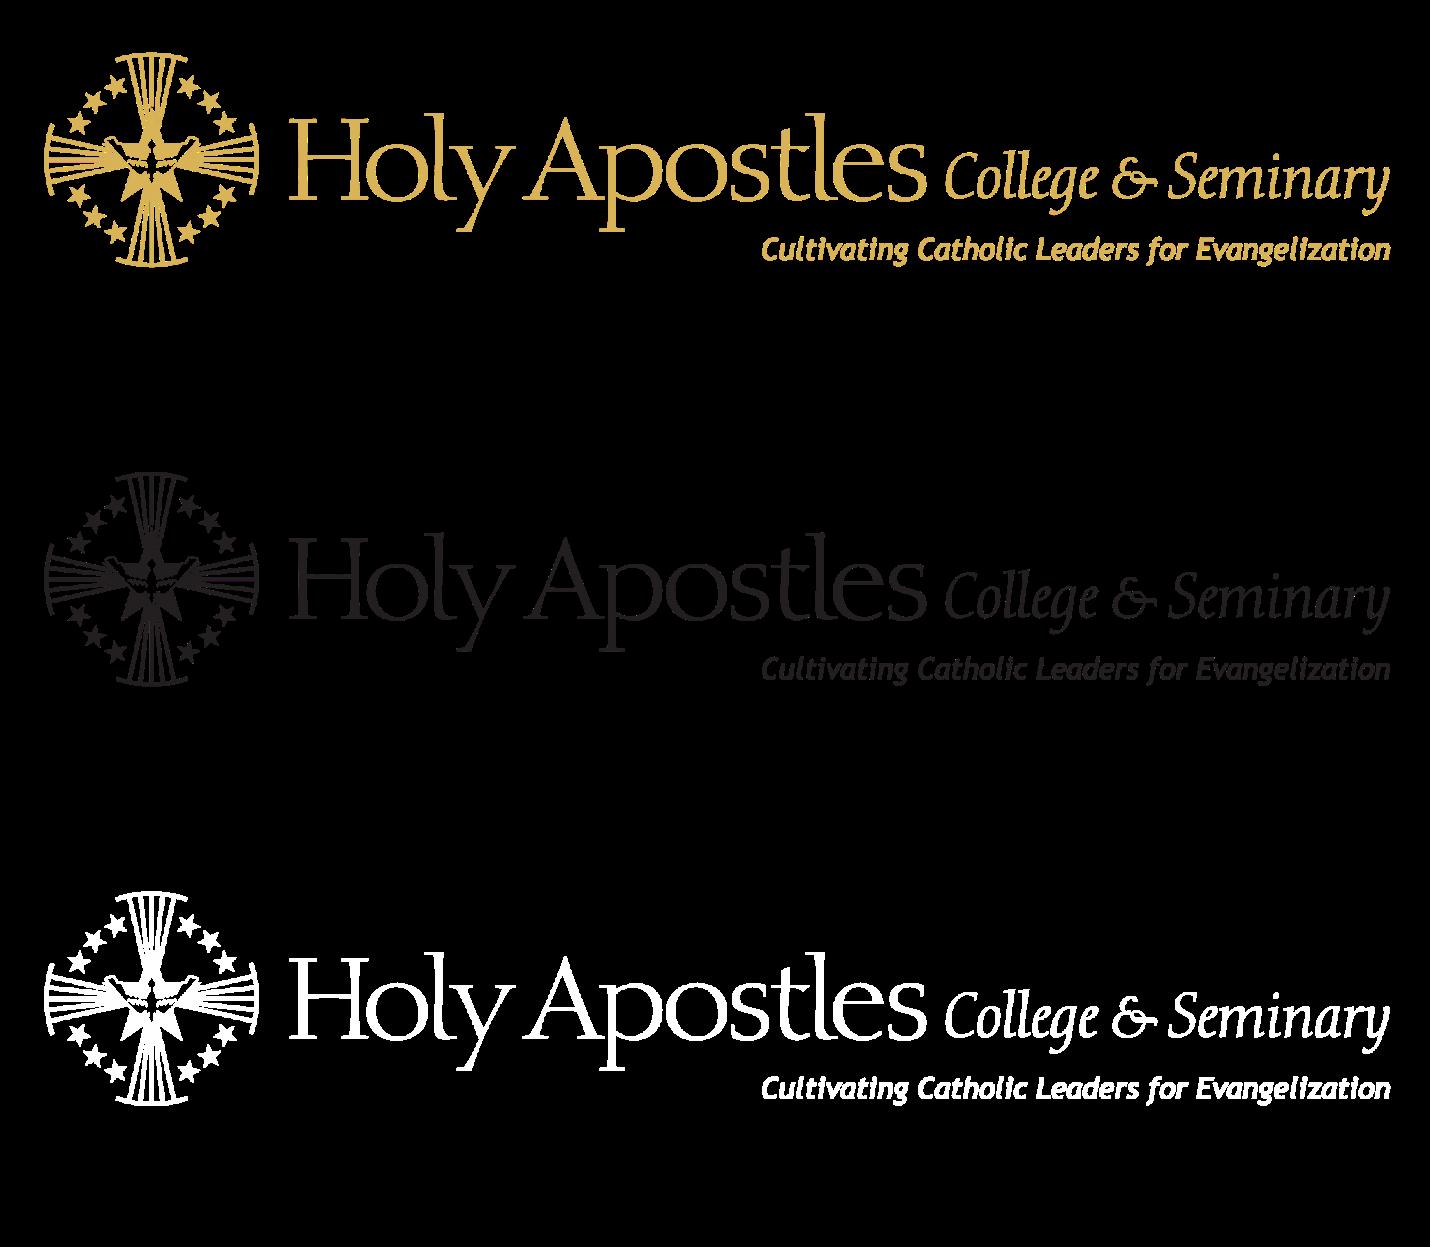 Description: HACS-logo-master-small